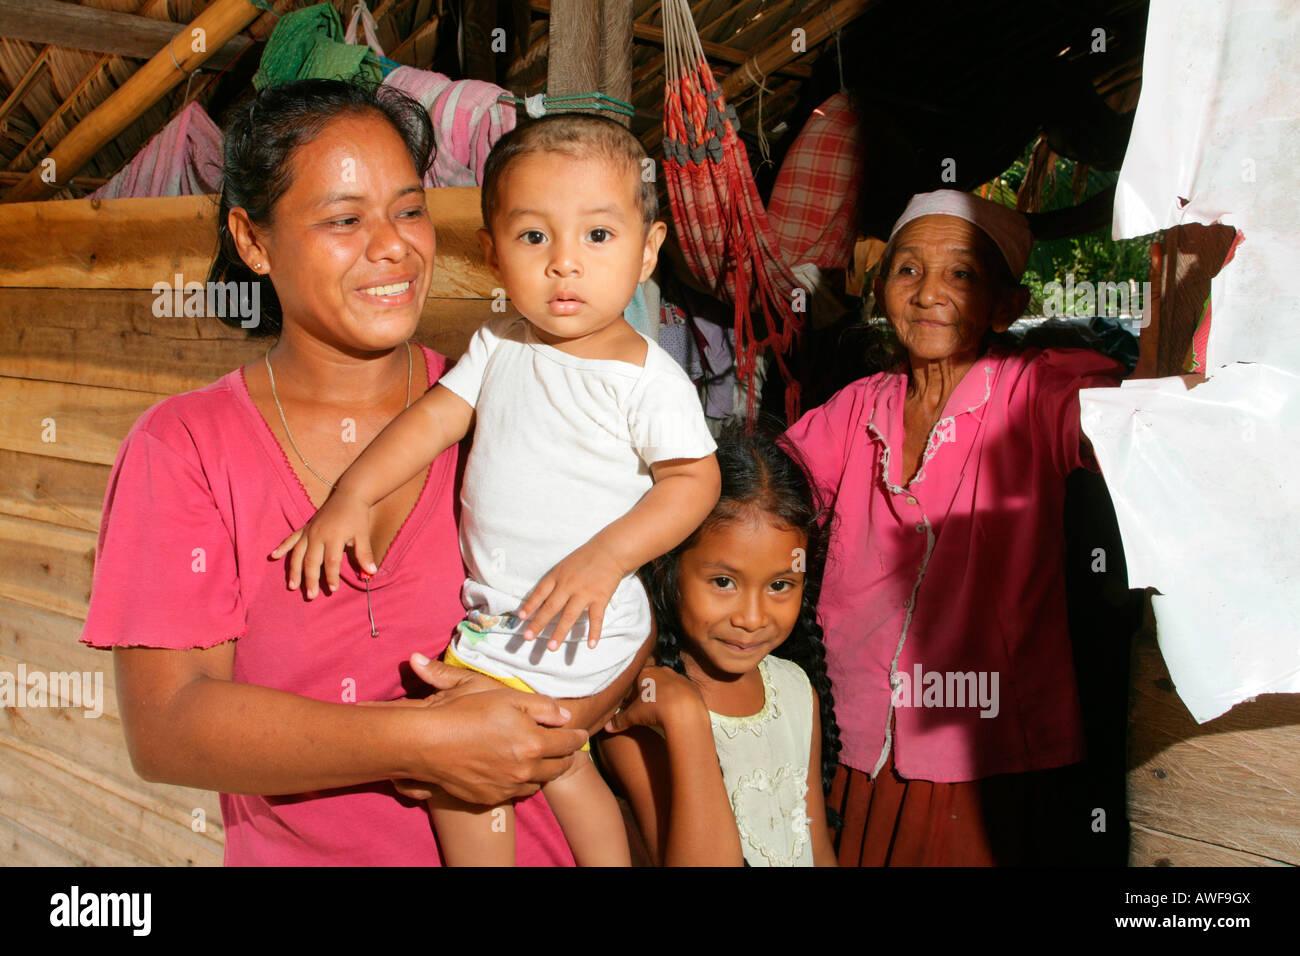 Three generations, Amerindians of the Arawak tribe, Santa Mission, Guyana, South America - Stock Image